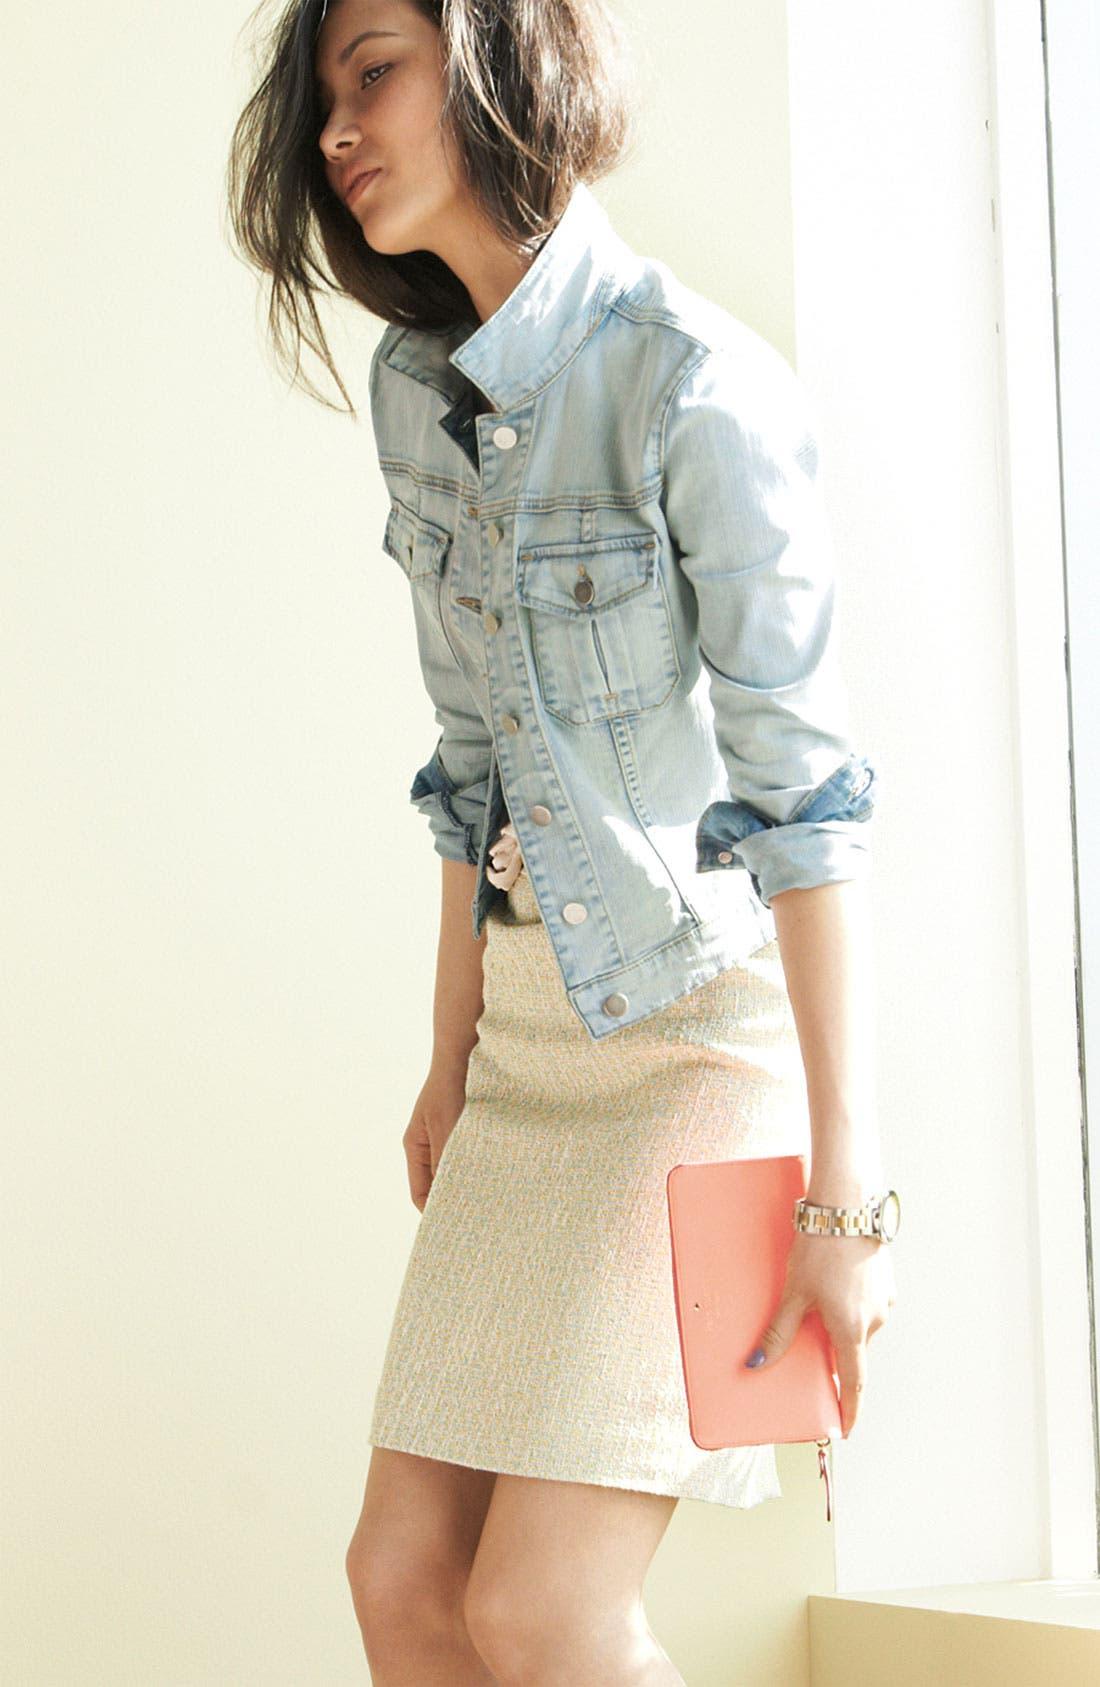 Alternate Image 1 Selected - KUT from the Kloth Denim Jacket & Halogen Tweed Skirt